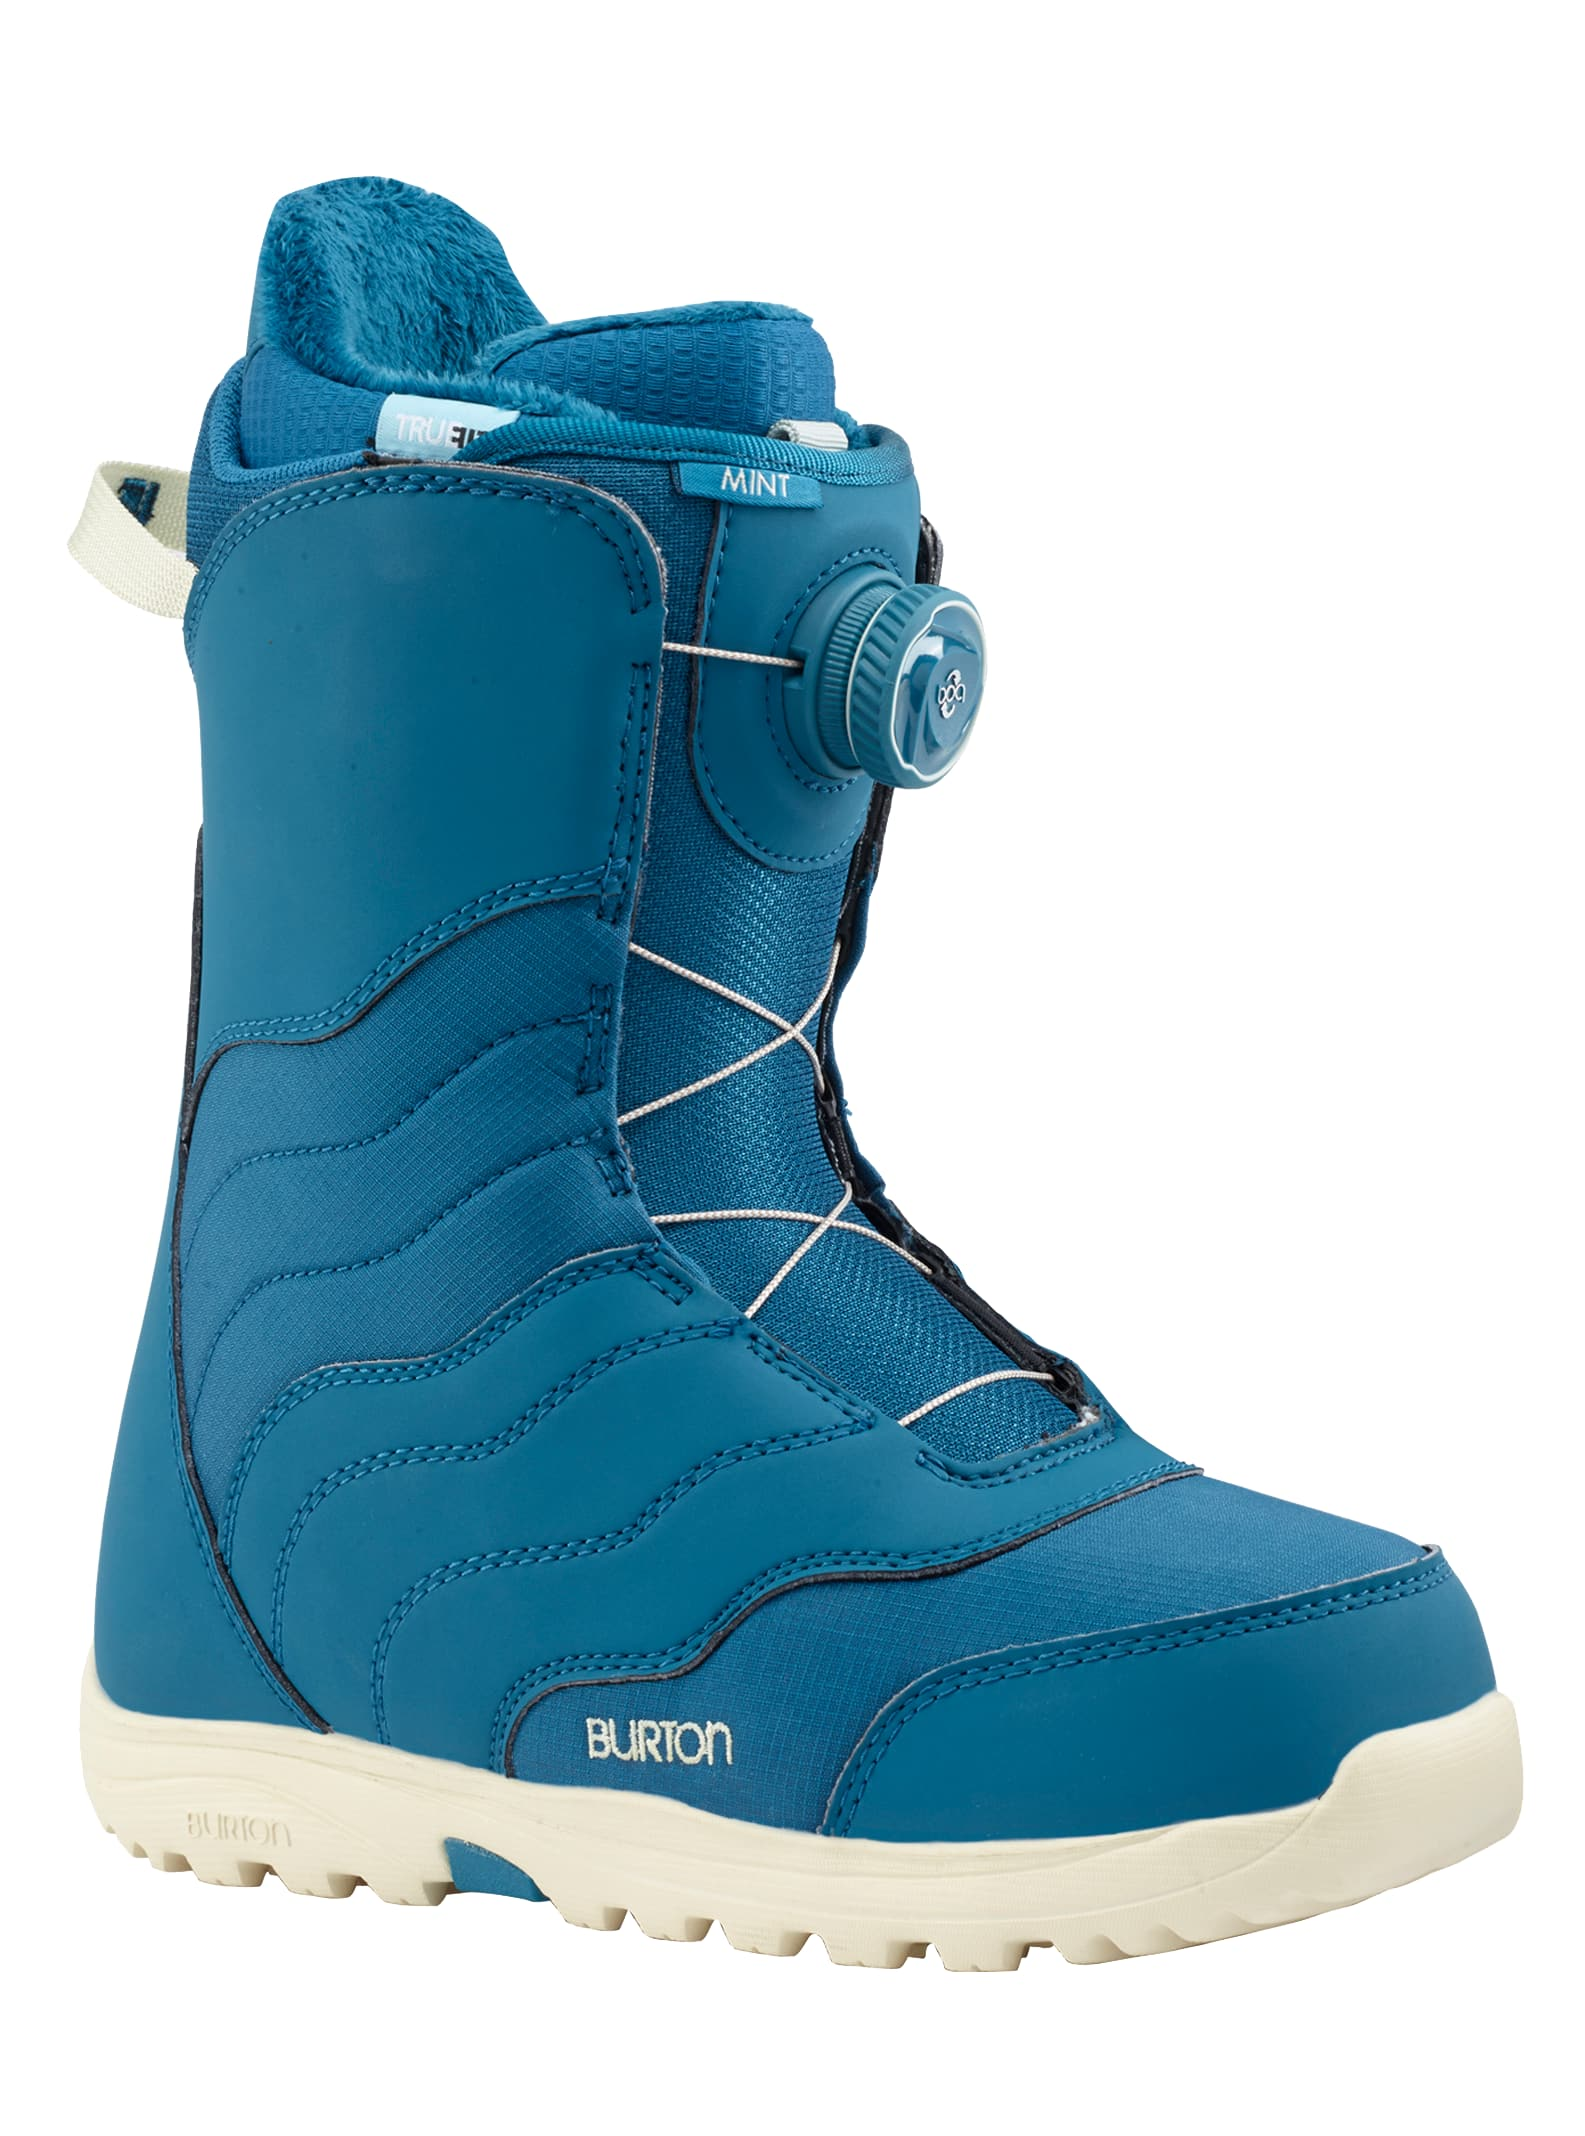 Women's Burton Mint Boa® Snowboard Boot